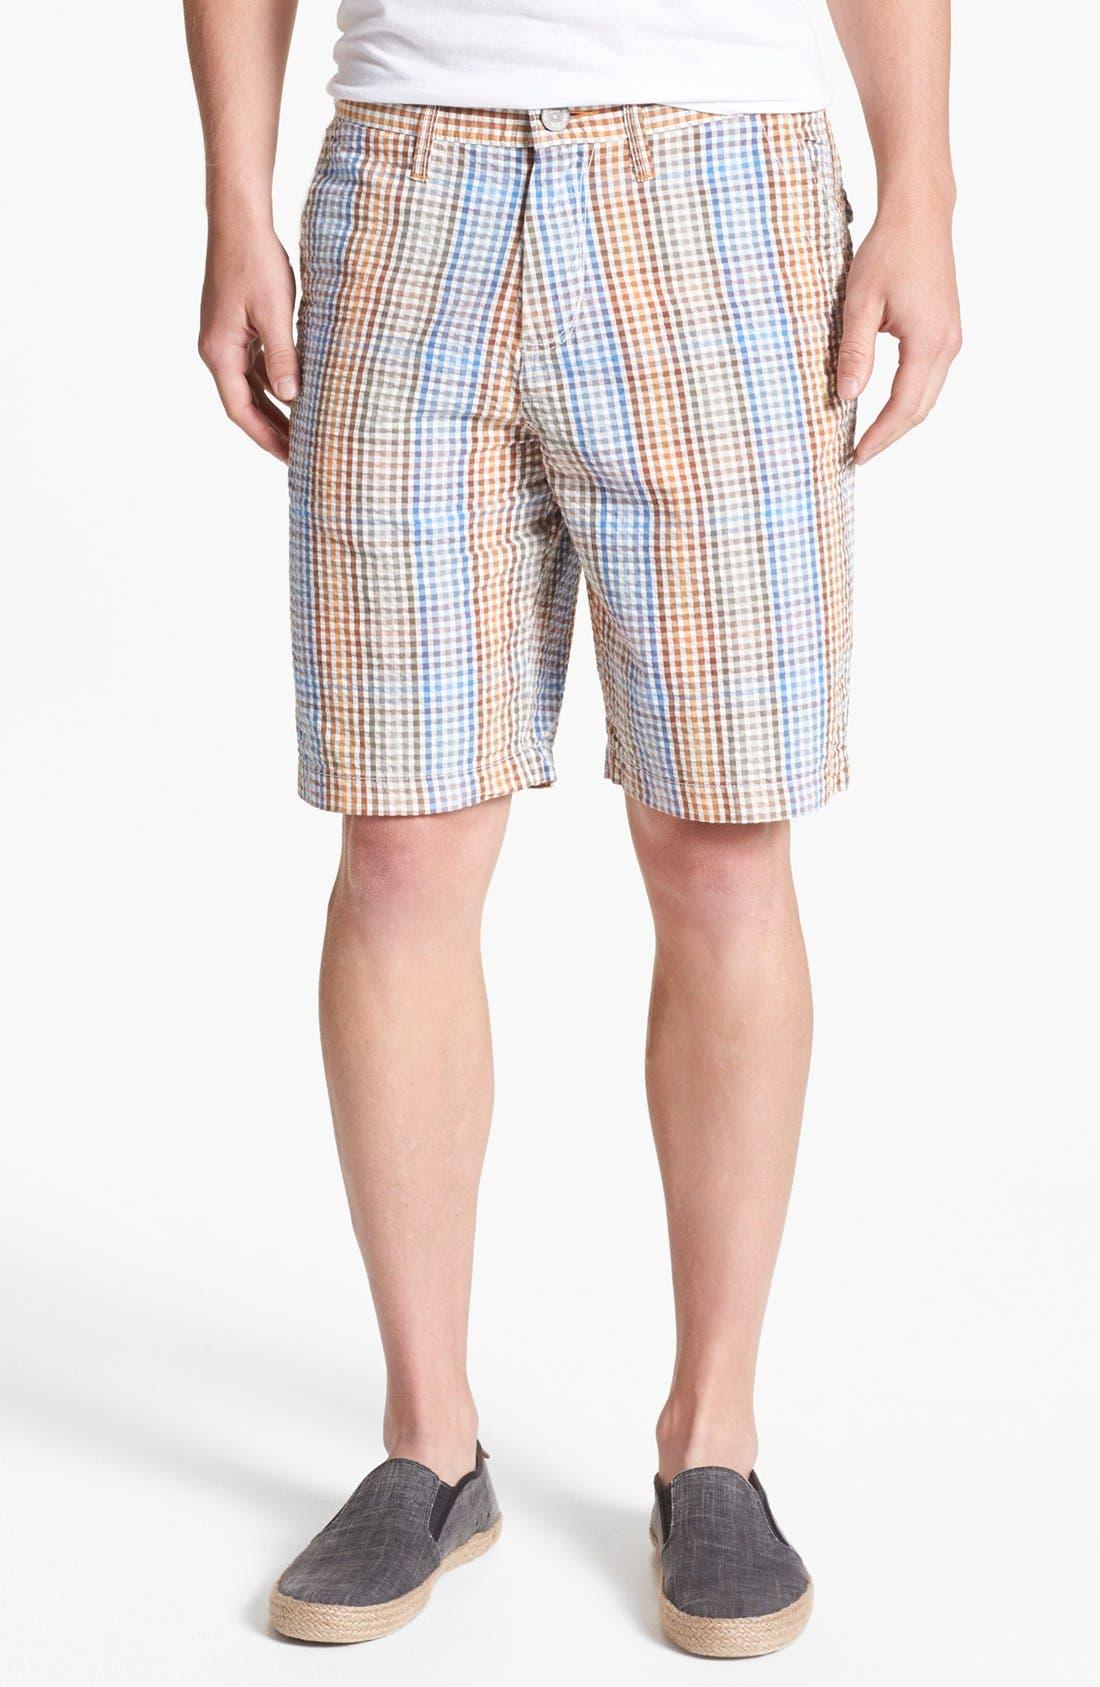 Alternate Image 1 Selected - Tommy Bahama Denim 'Reef Ridge' Seersucker Shorts